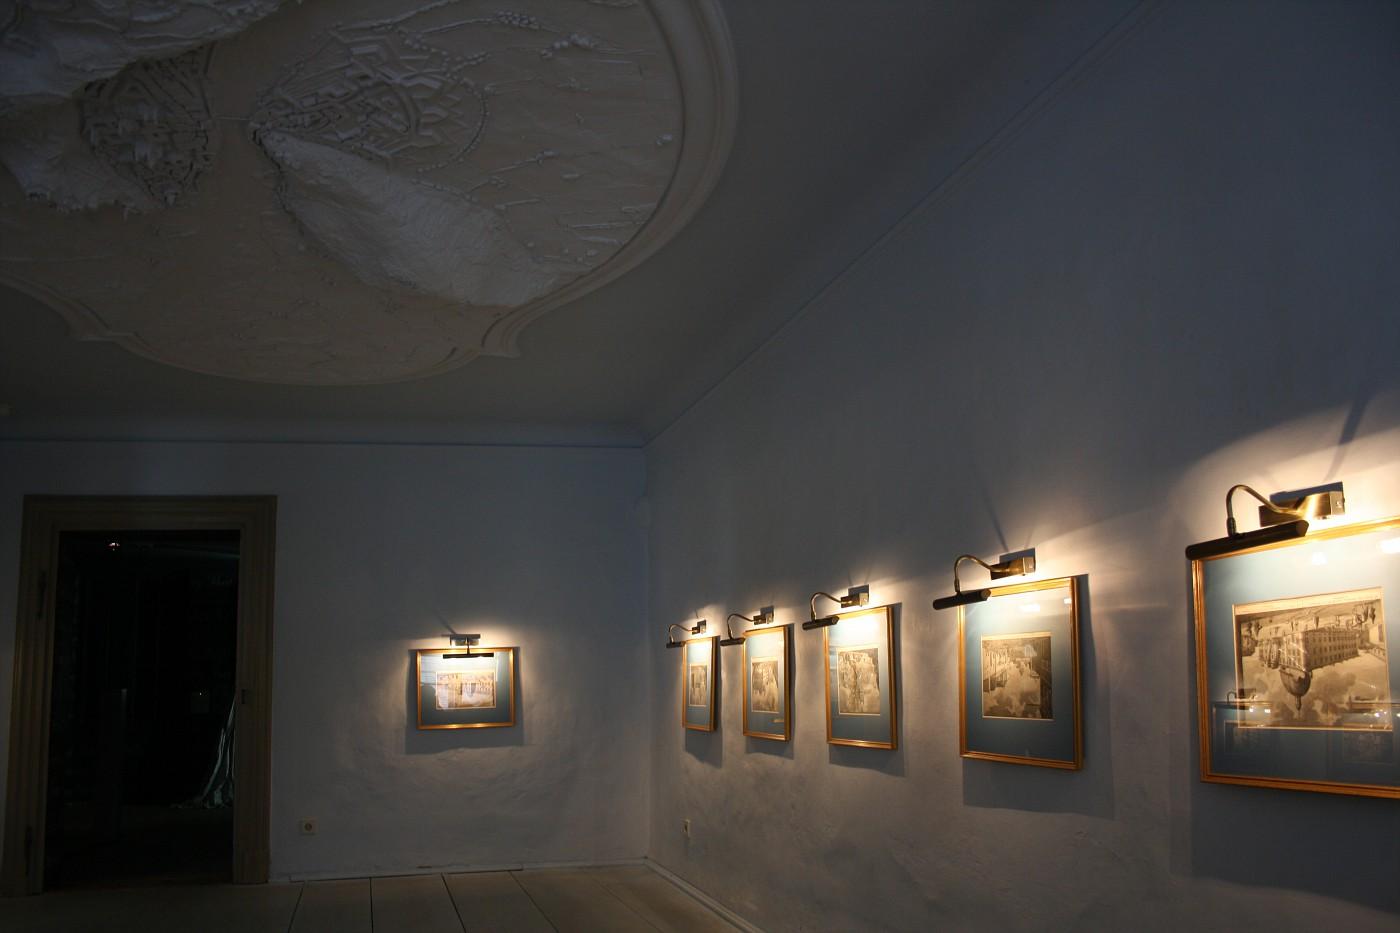 http://images41.fotki.com/v195/photos/2/243162/8488810/Salzburg21-vi.jpg